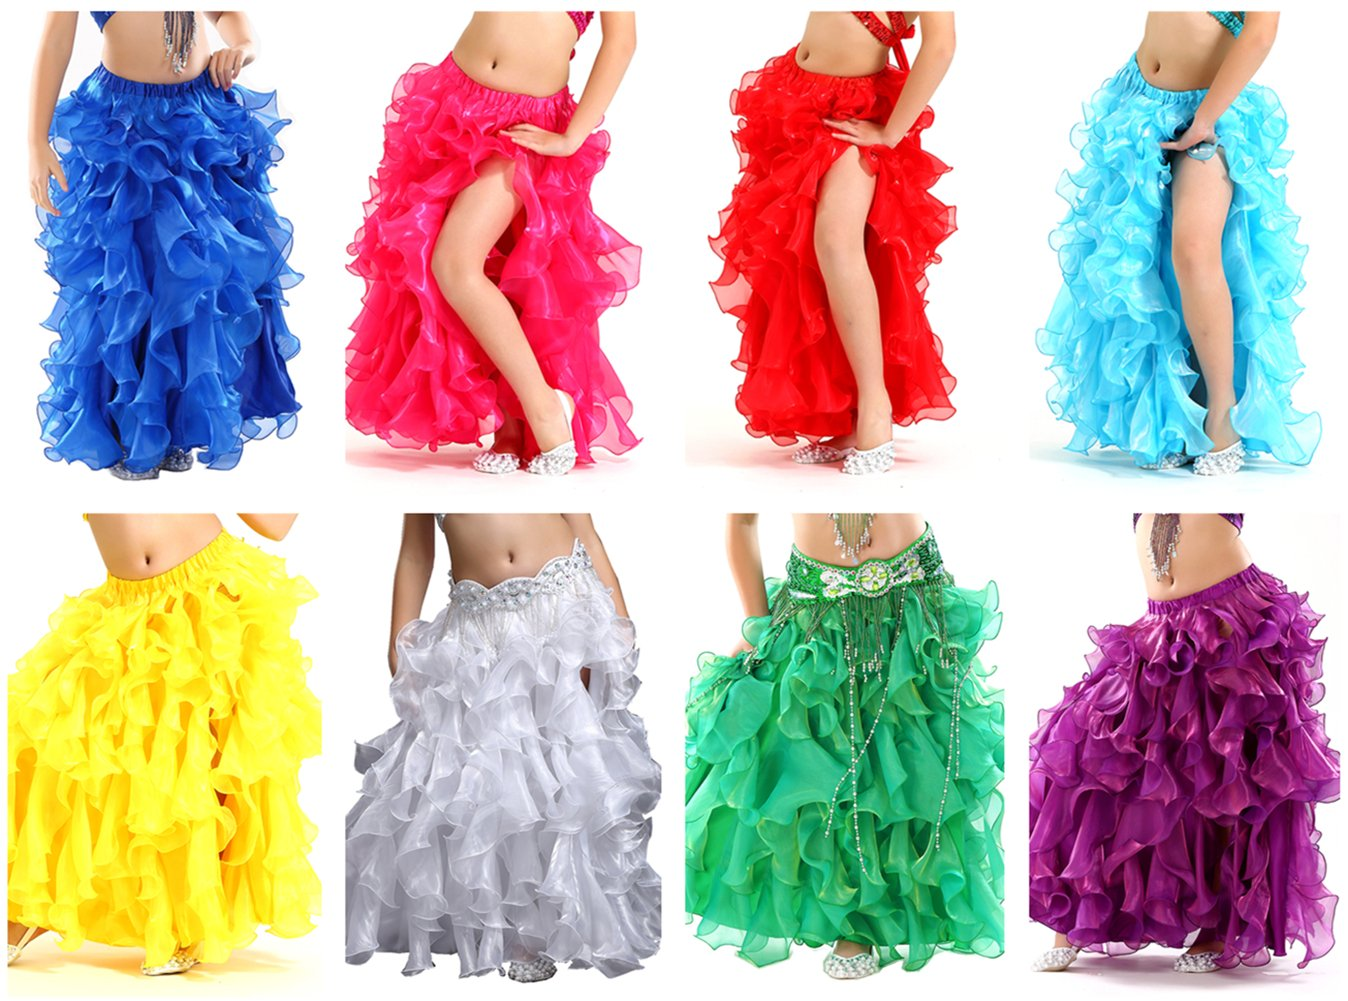 Demon Baby Girls' Belly Dance Side Slit Skirt Princess Party Latin Split Skirt Flower Laced Ball Gown(8Piece/Set,M)